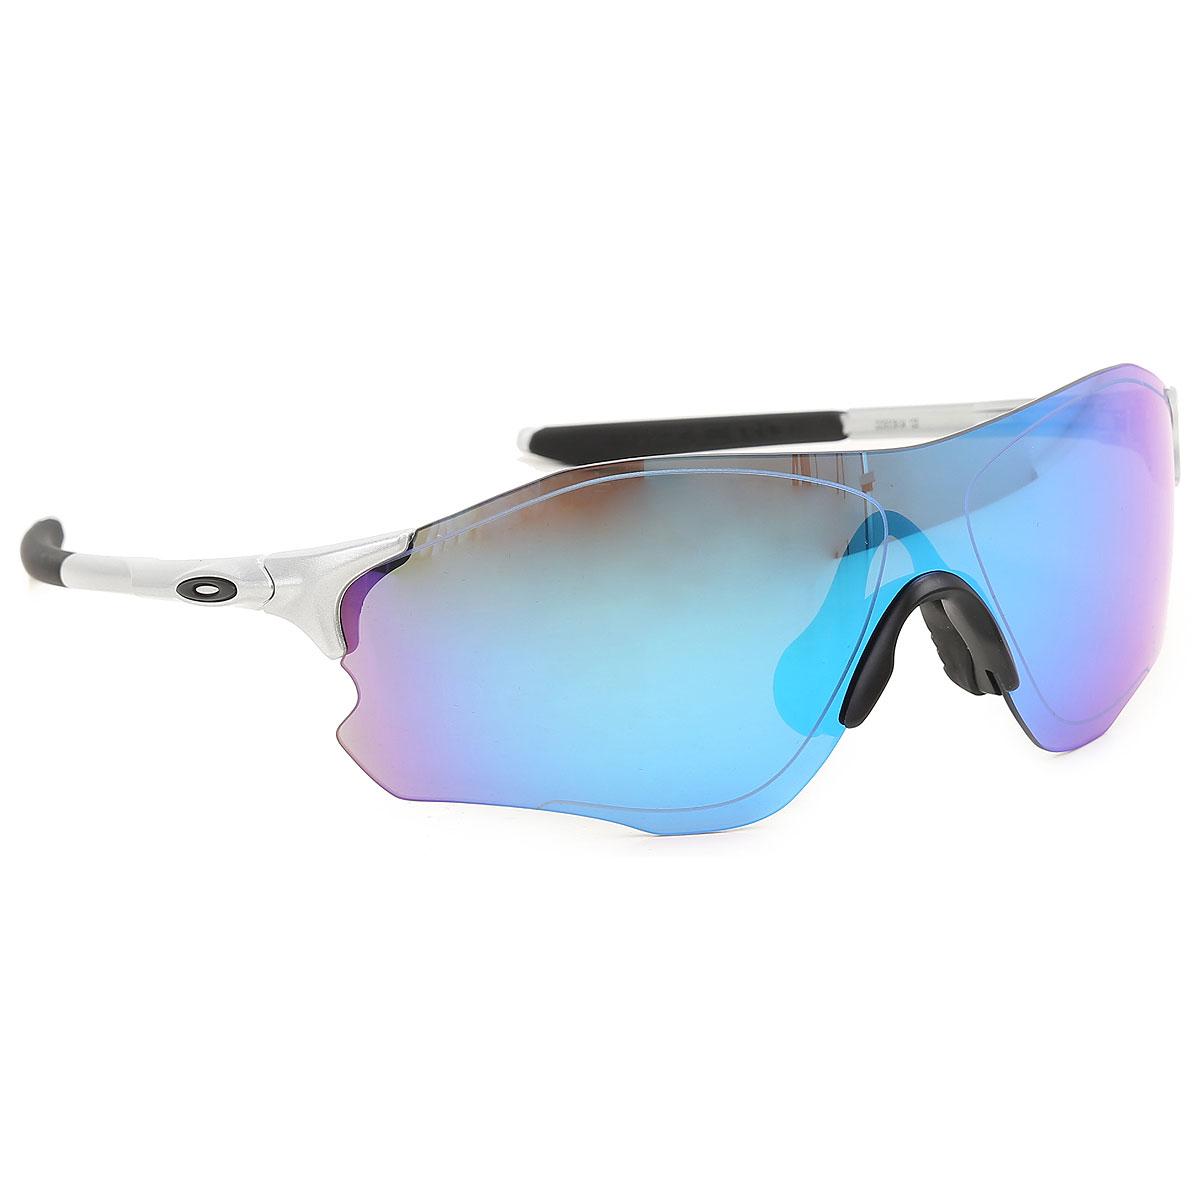 Oakley Sunglasses On Sale, Silver Gray, 2019